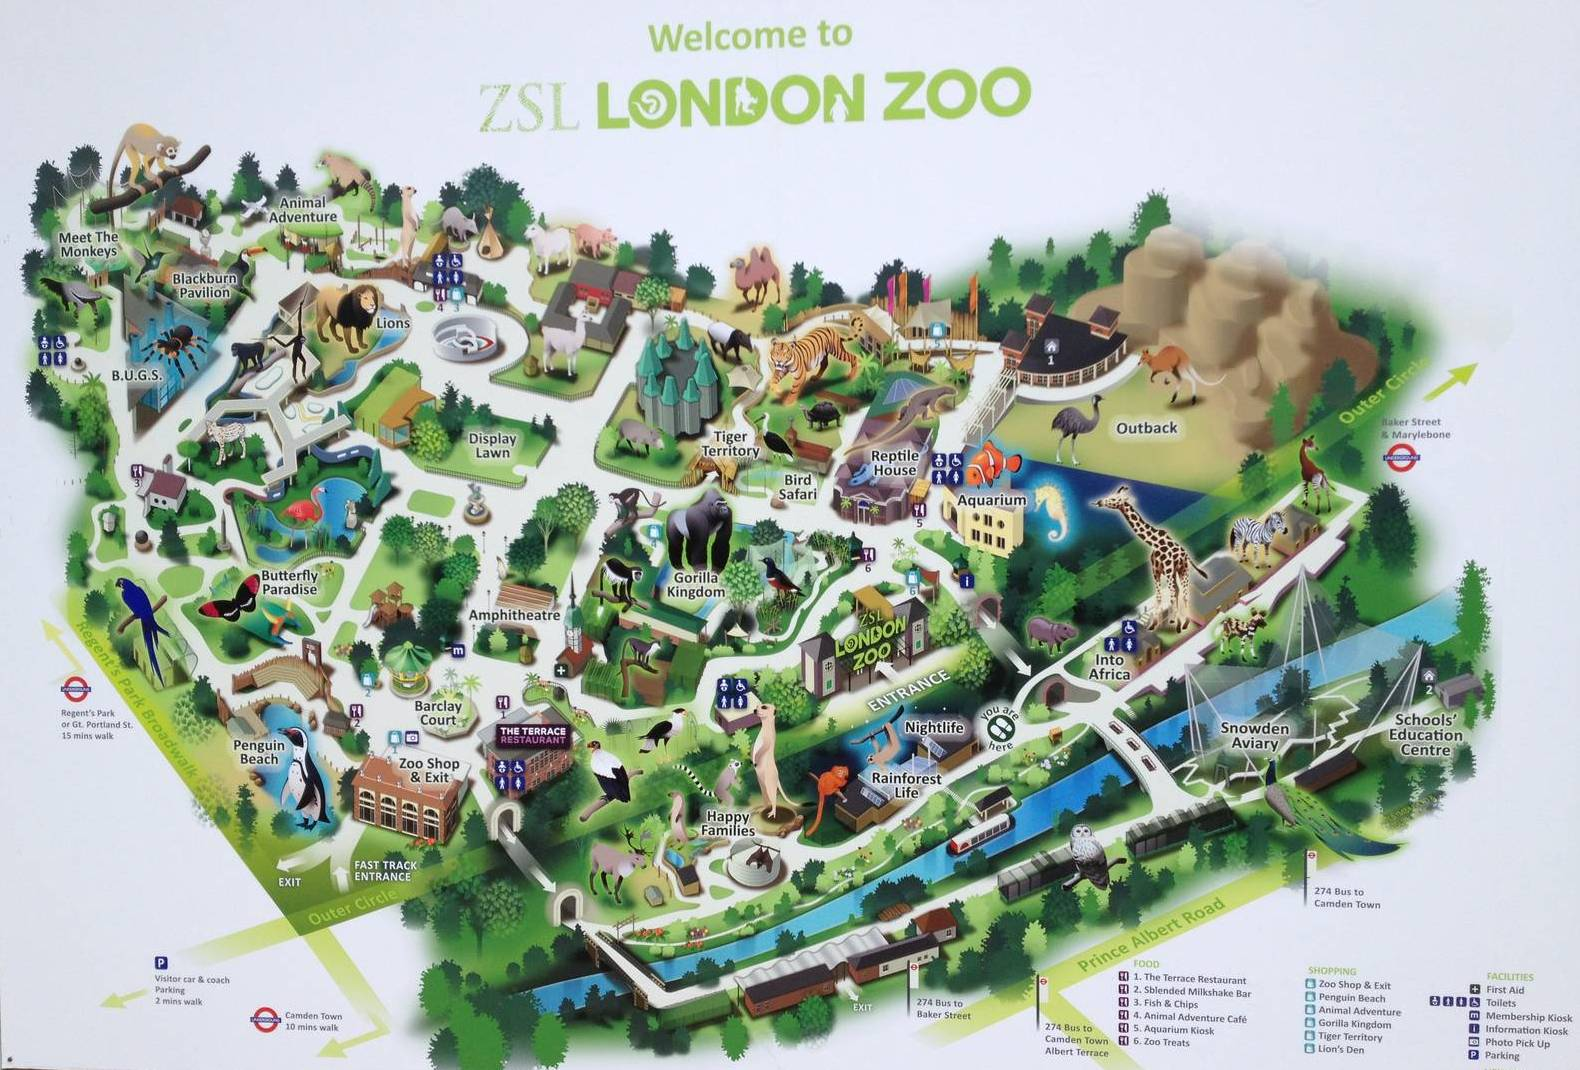 Alain Elkann Interviews David Field Zoological Director of the